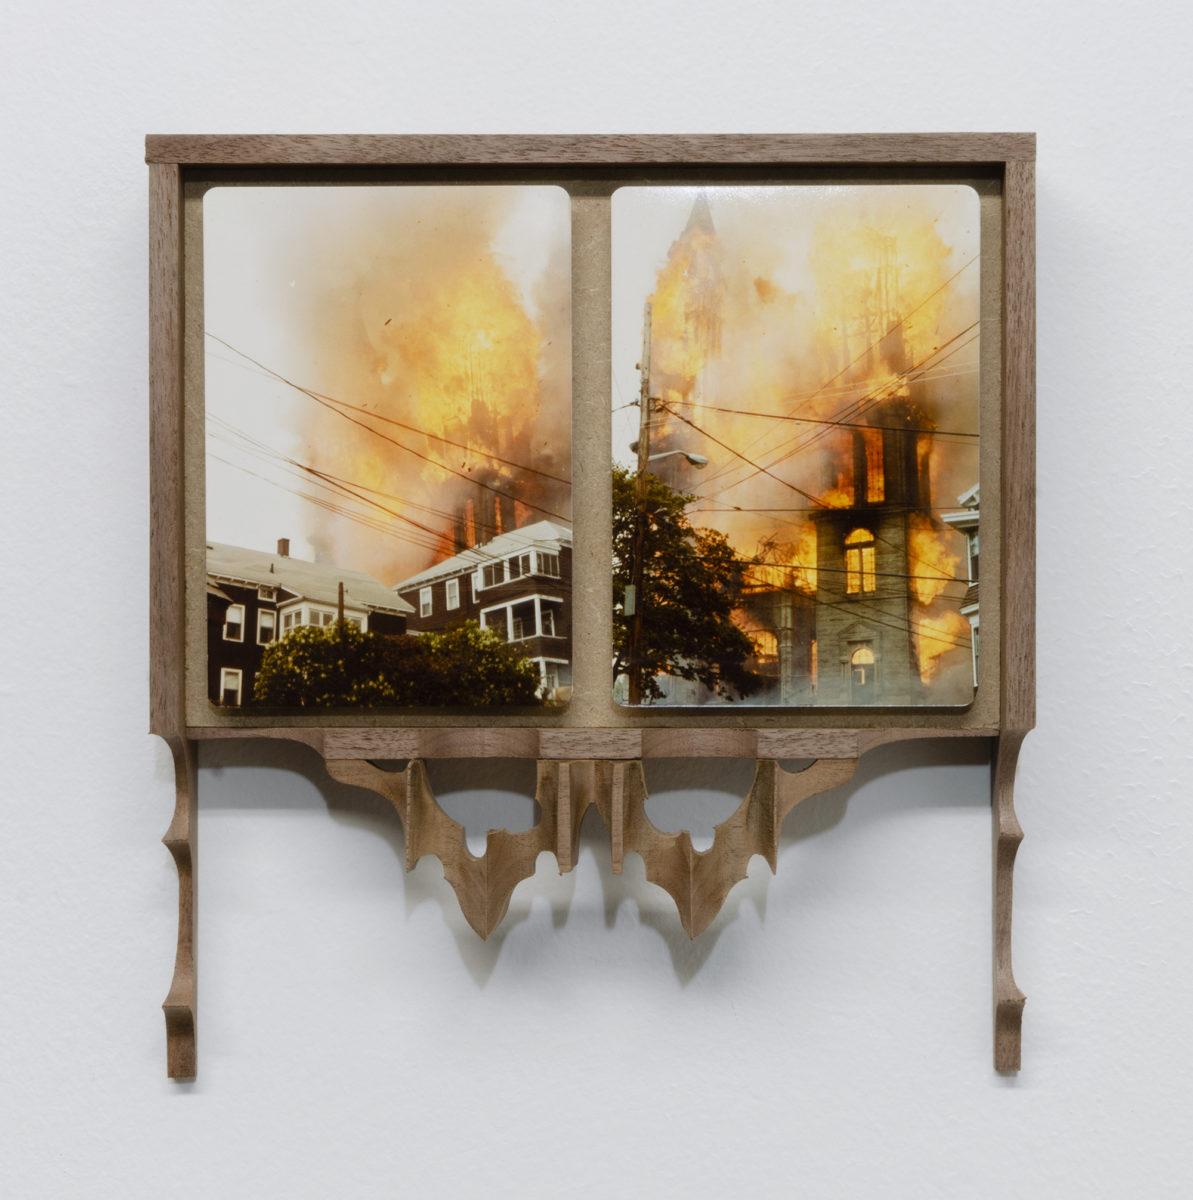 Harry Gould Harvey IV, As The Lanterns Dim, 2020. Courtesy of the artist and Bureau, New York.